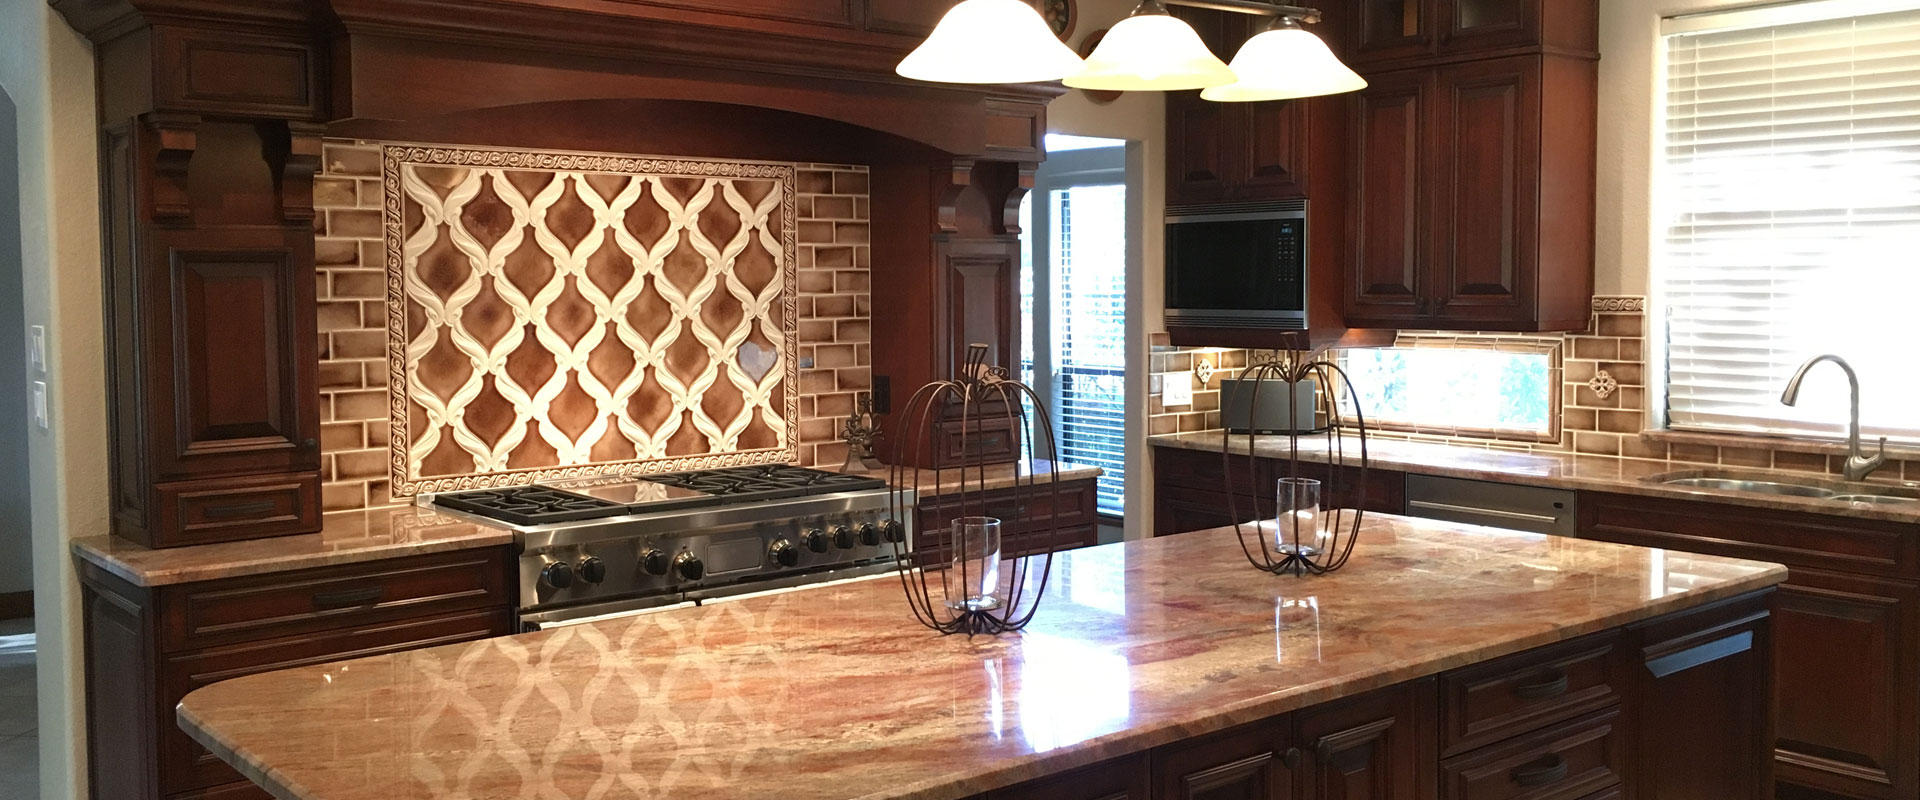 kitchen design & remodeling in pasadena, tx   bay area kitchens